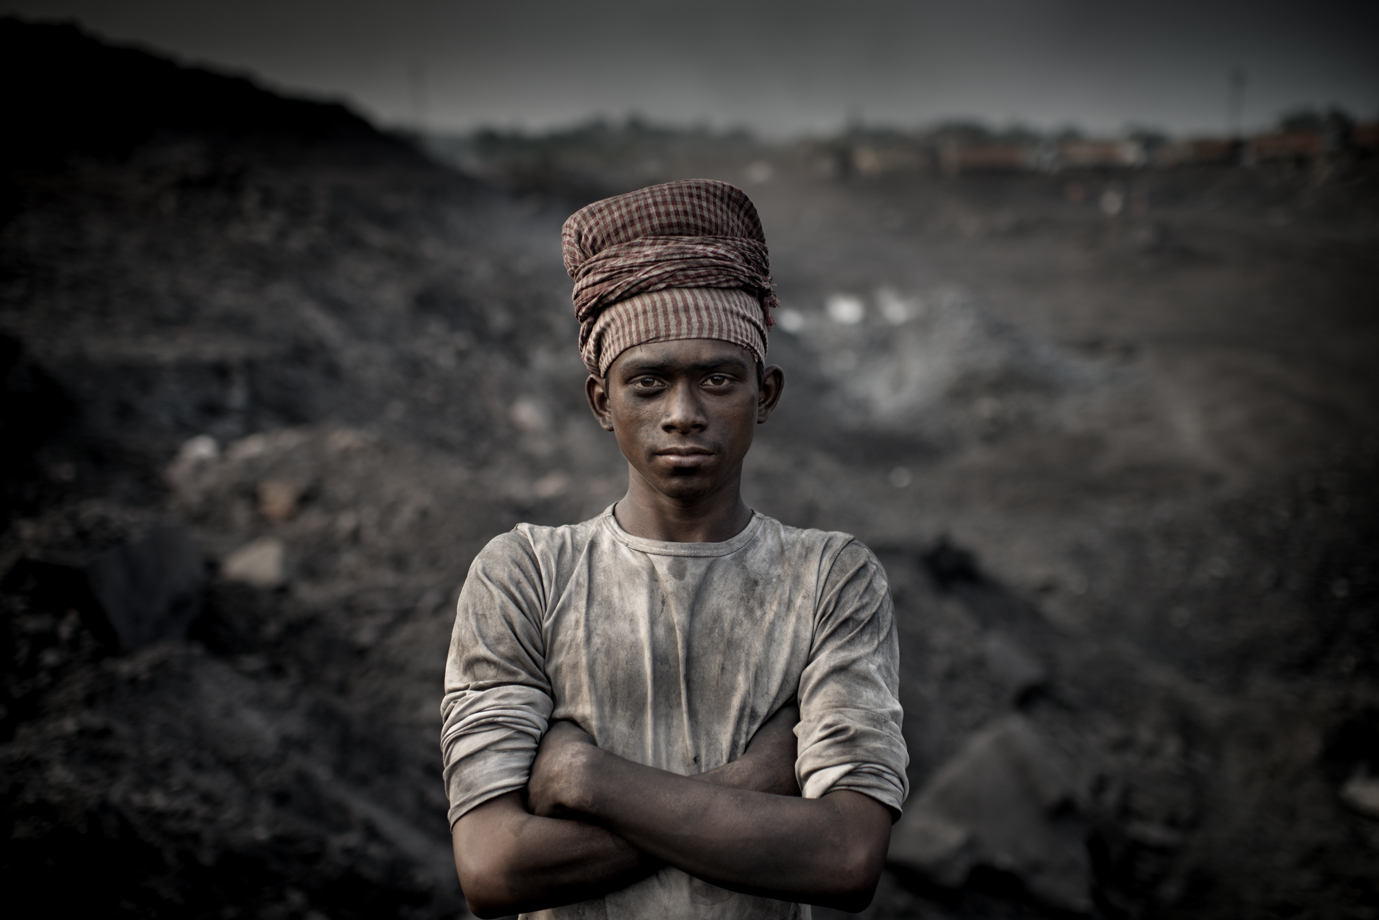 Coal miner, Jharkhand / India